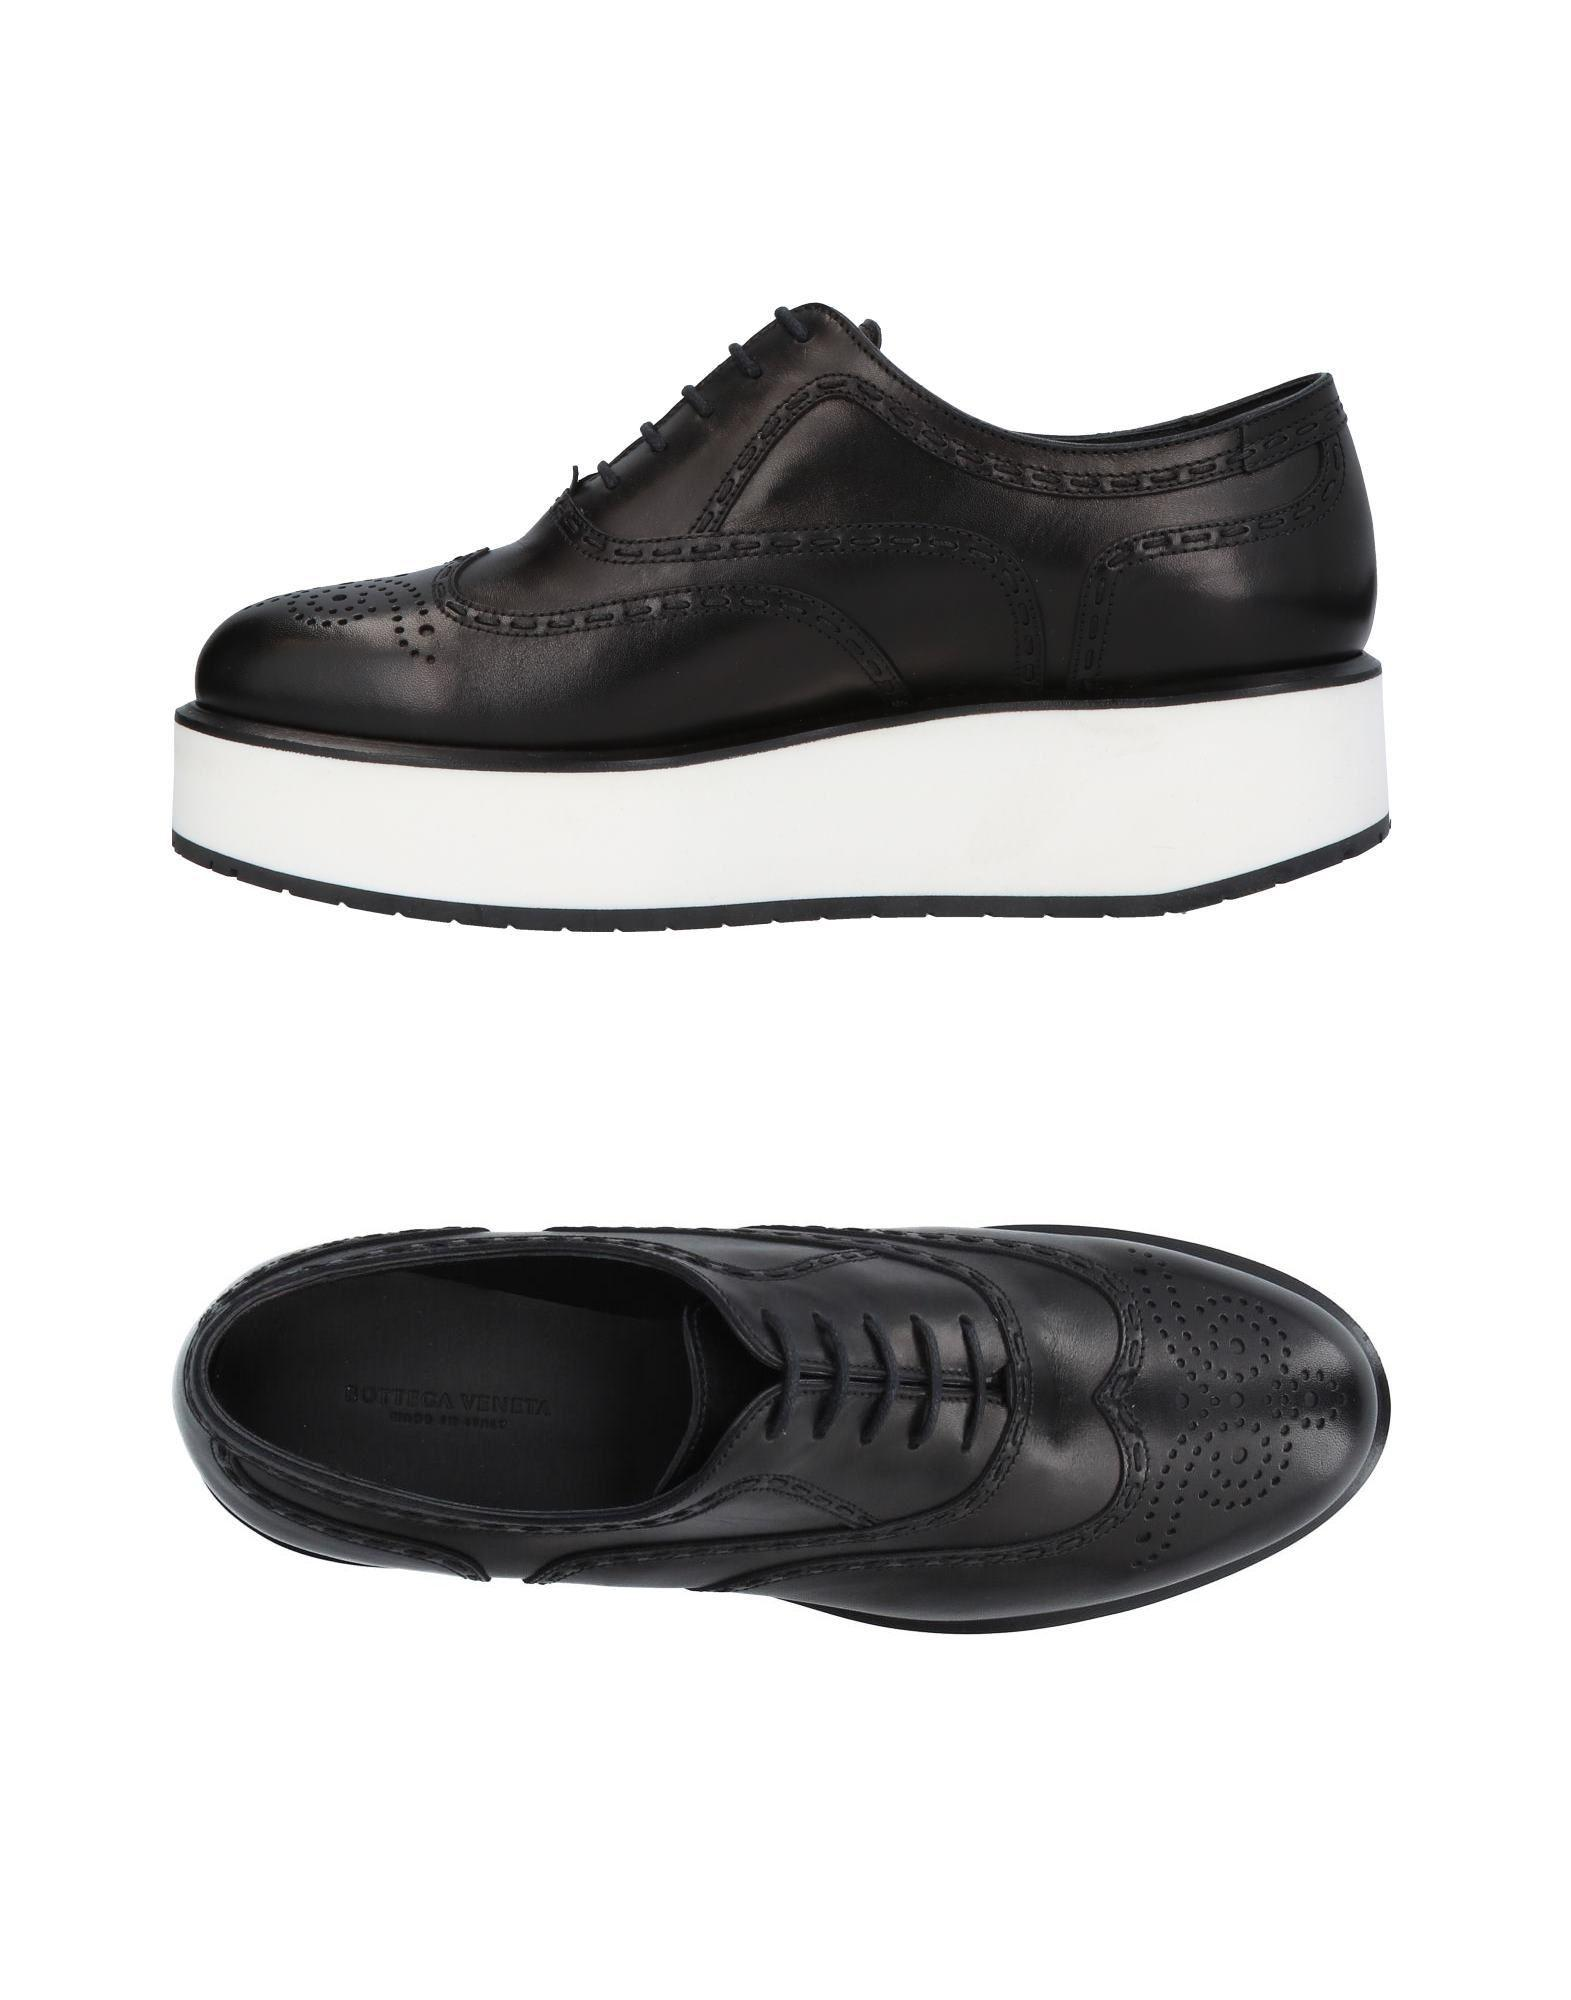 Bottega Veneta Lace-Up Shoes In Black